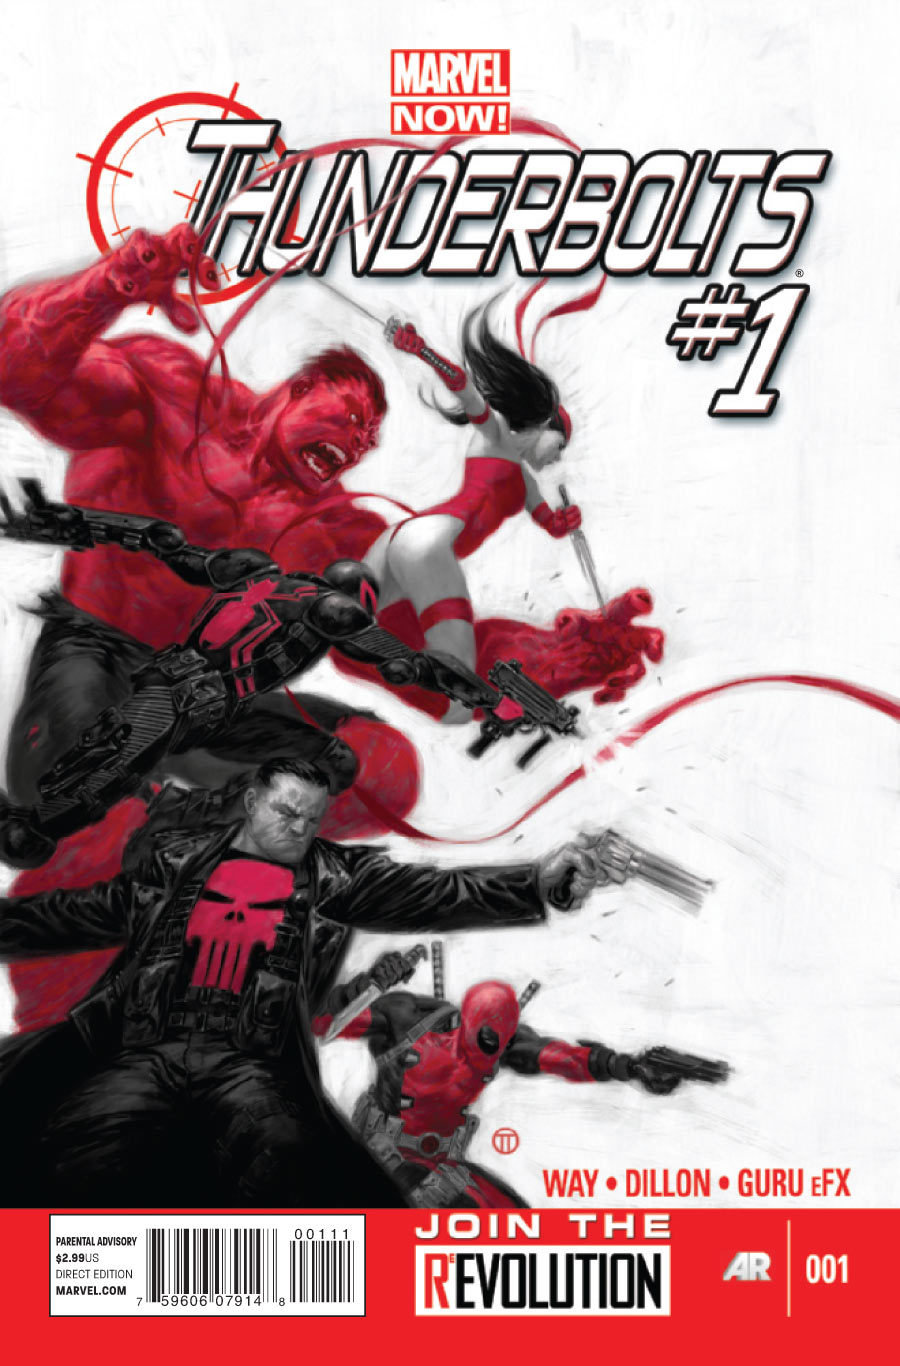 Leer Thunderbolts Volumen 2 Online en Español